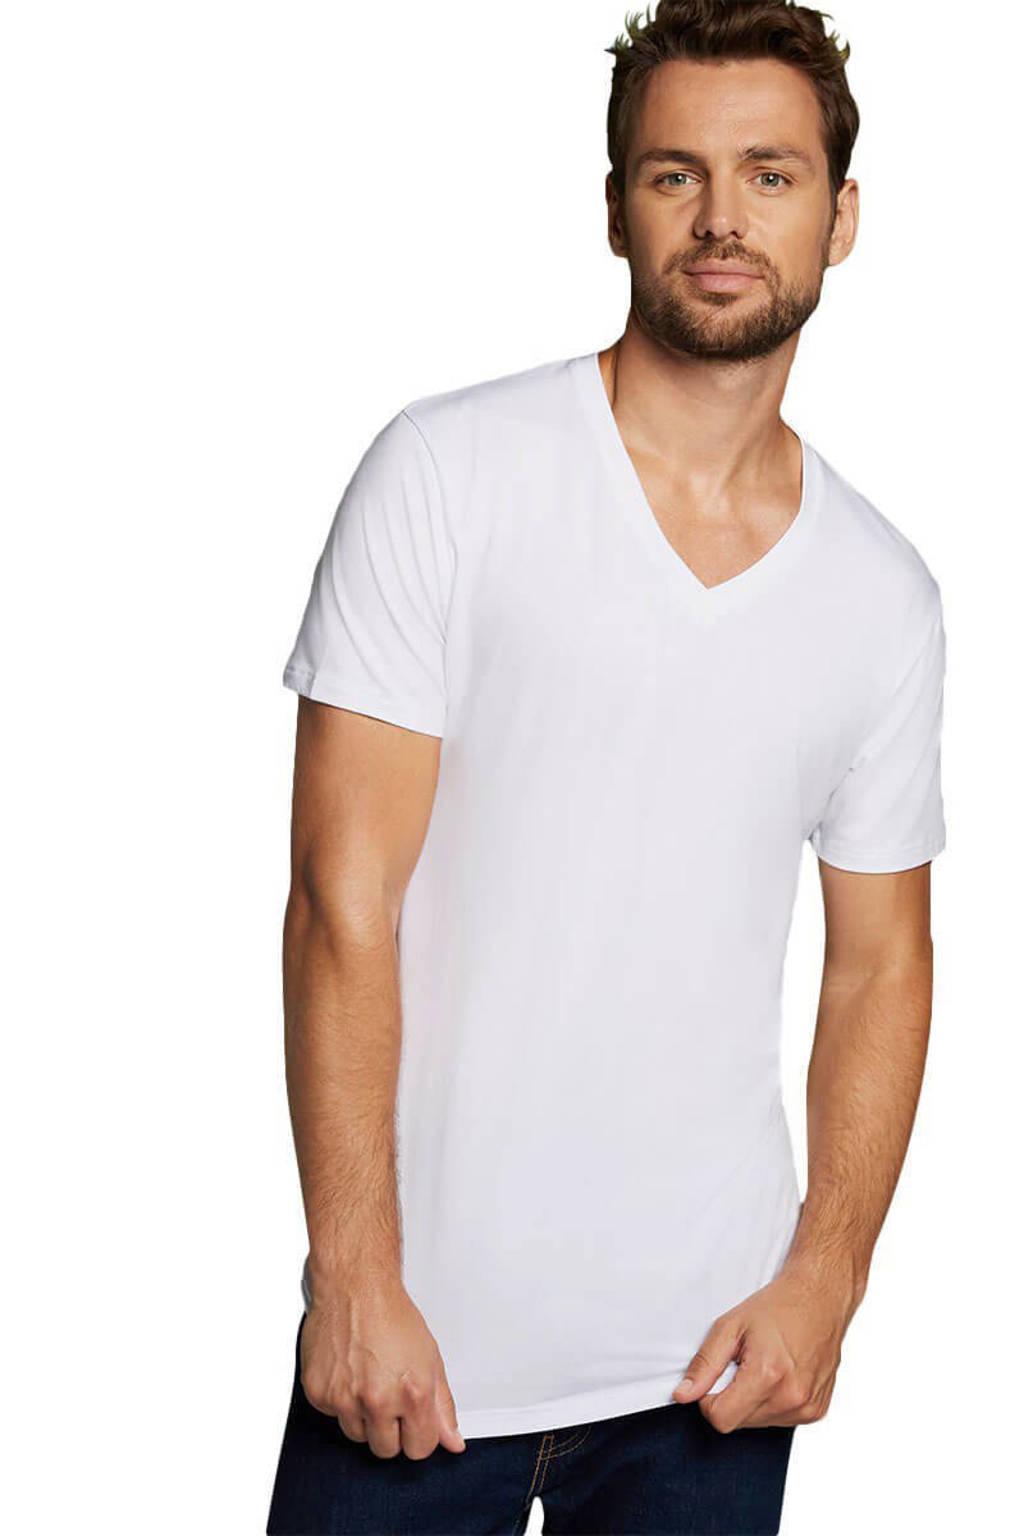 Bamboo Basics T-shirt Vinn met bamboe (set van 2) wit, Wit